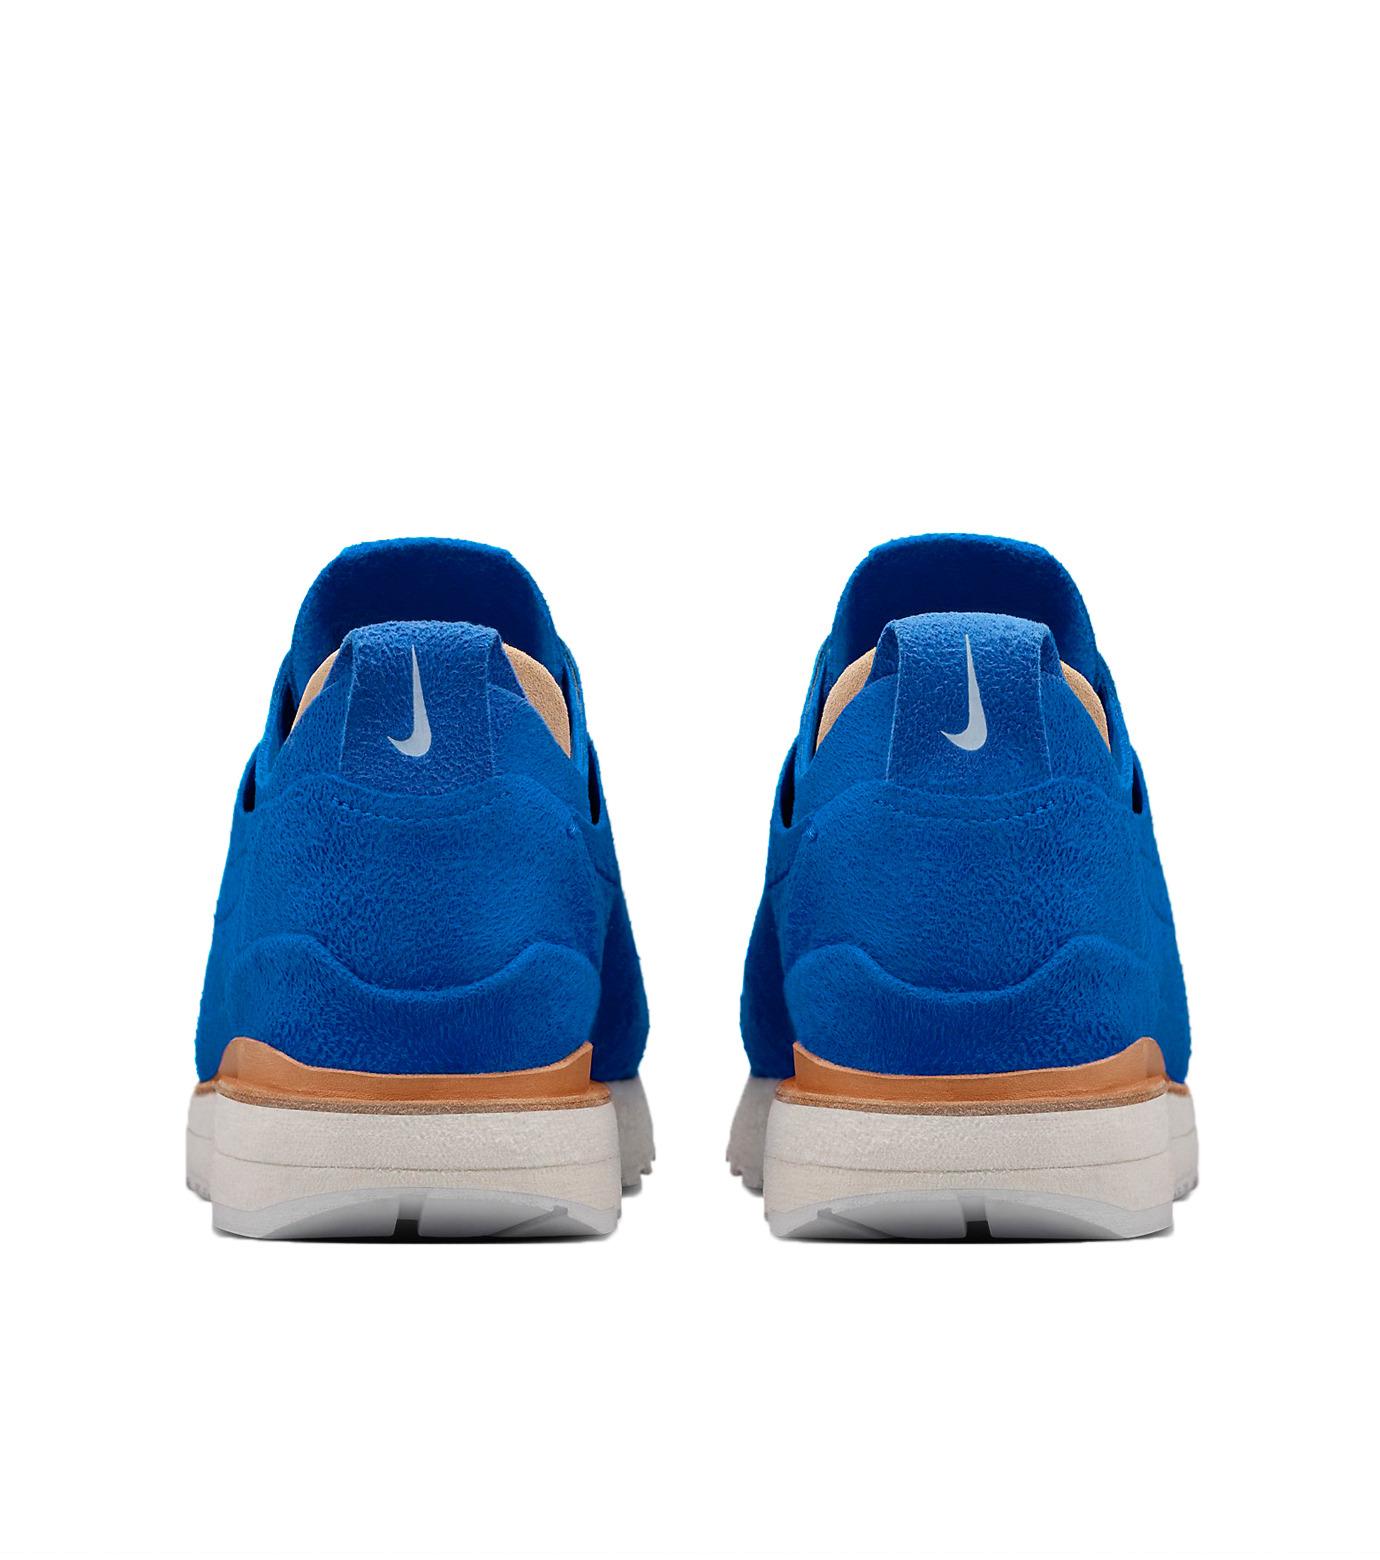 NIKE(ナイキ)のWMNS Air Max 1-BLUE(シューズ/shoes)-847672-400-92 拡大詳細画像5